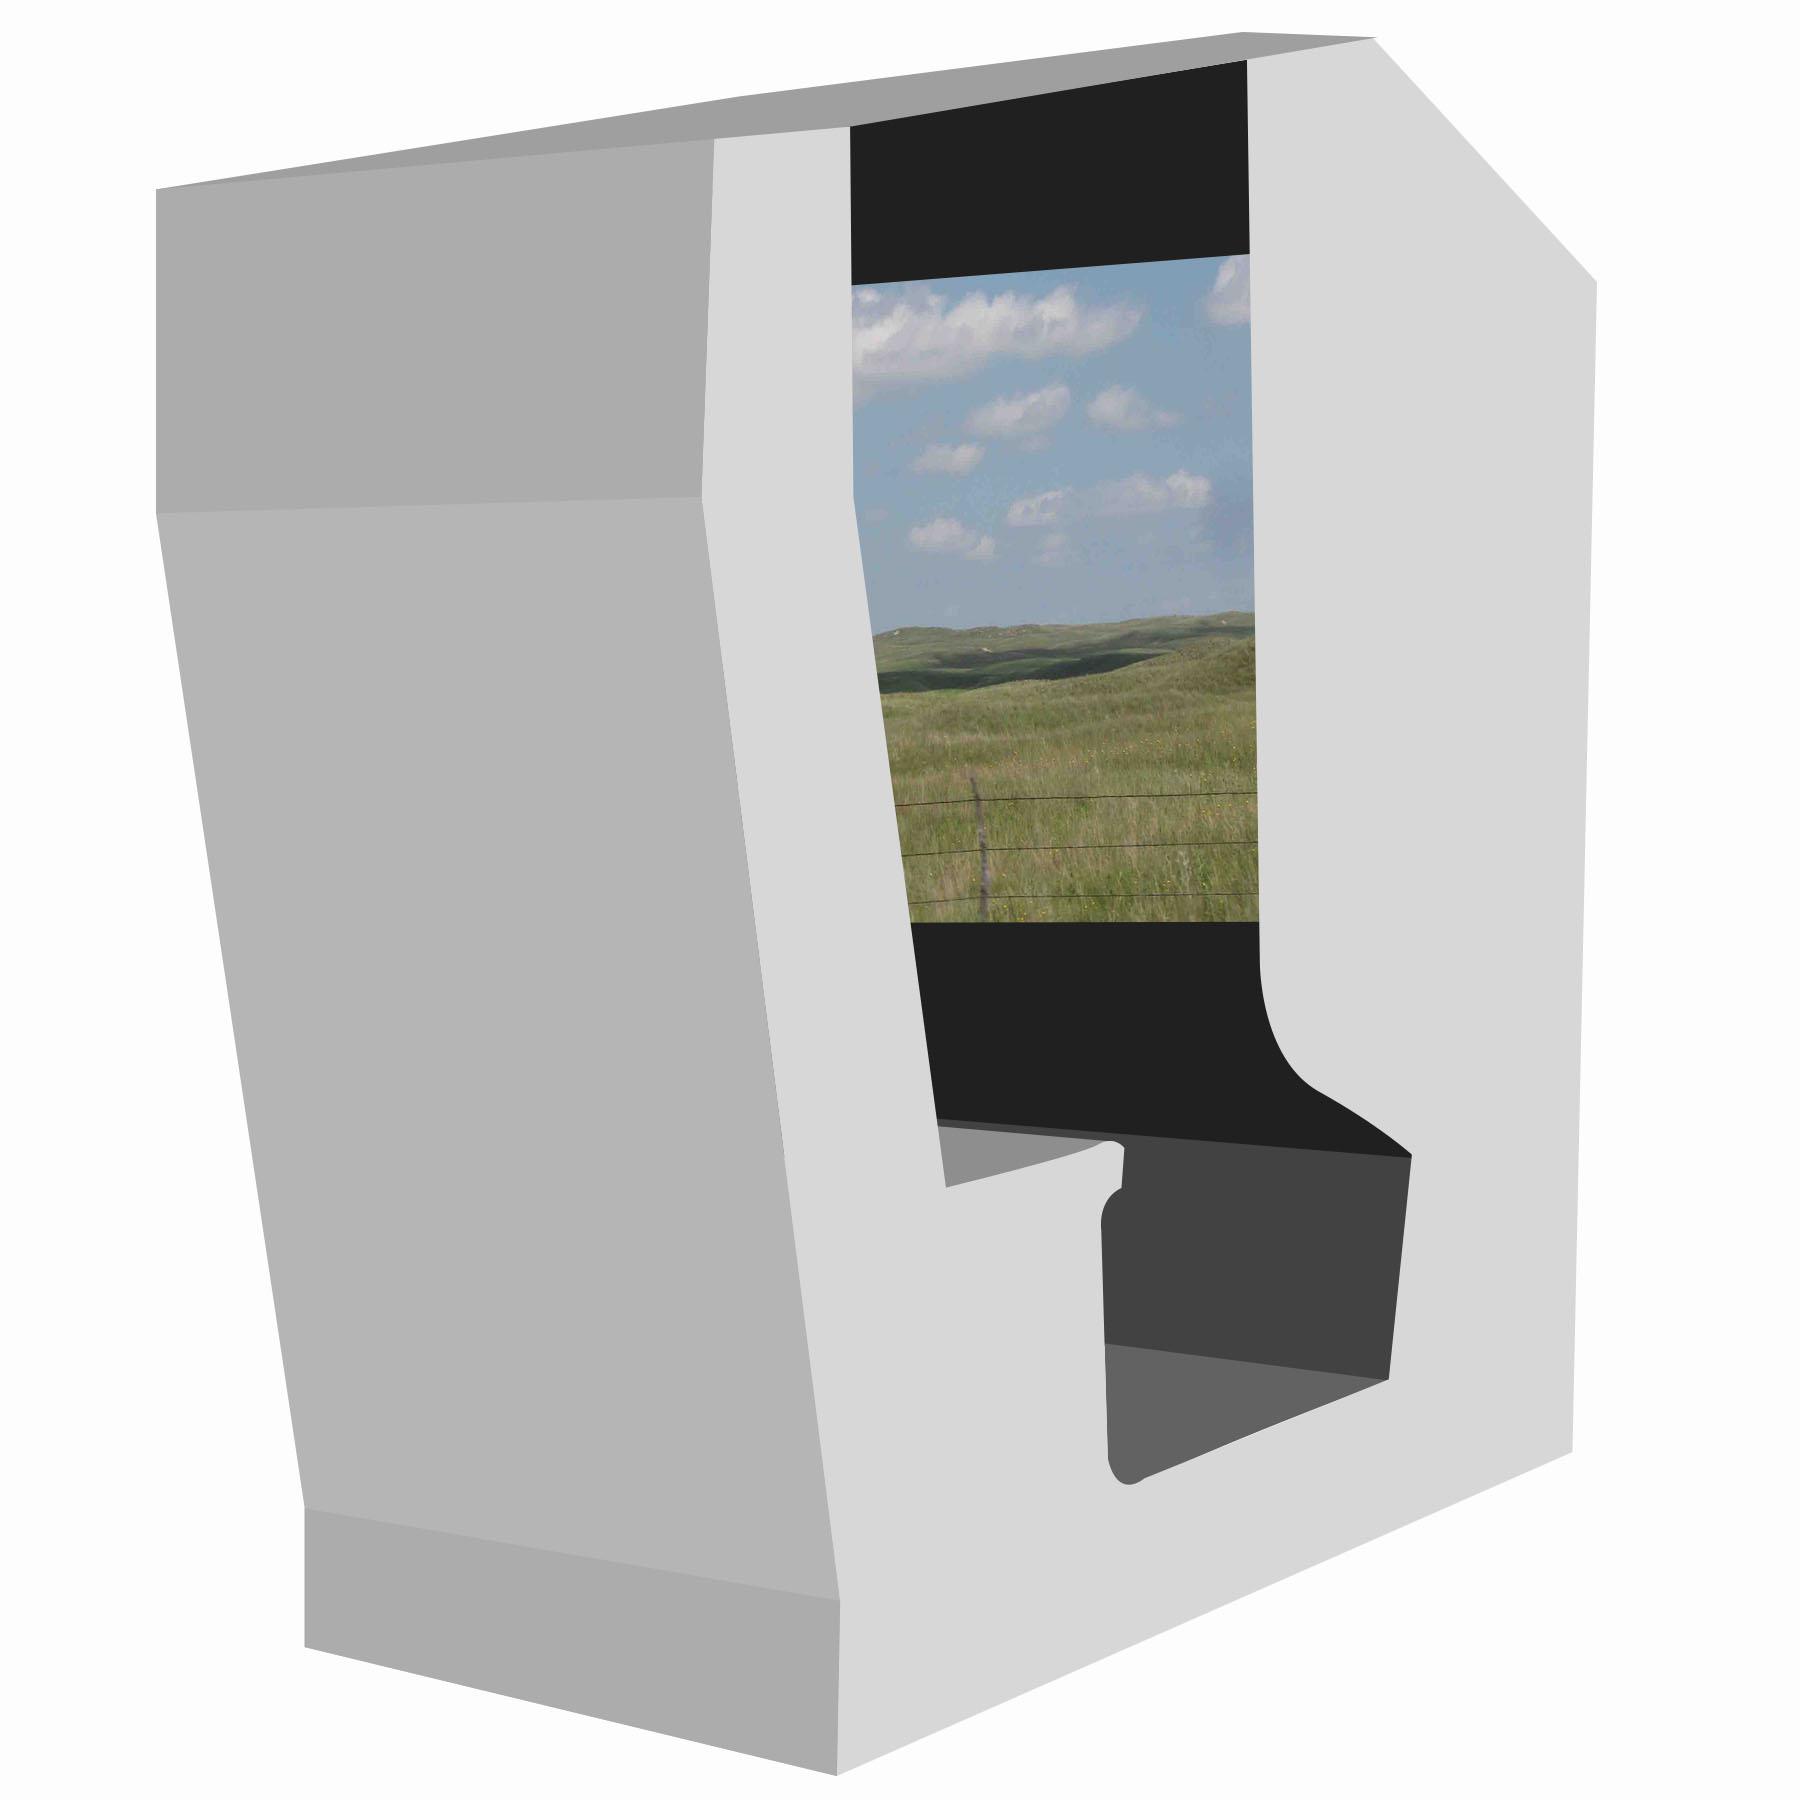 Monowi Booth (1).jpg